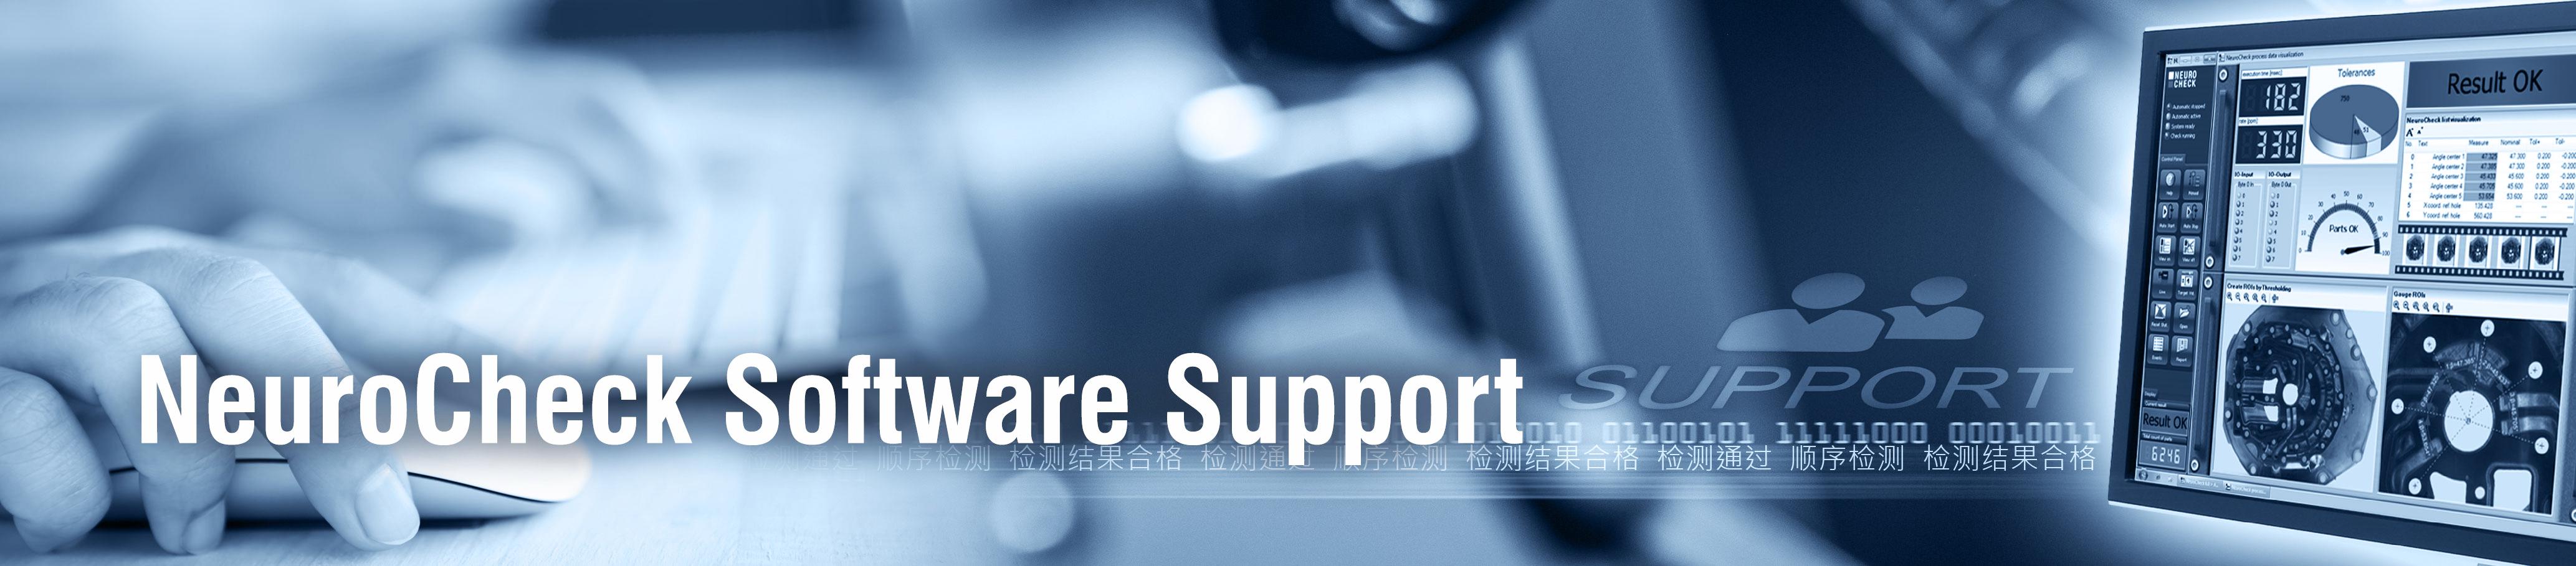 NeuroCheck Support (Image © NeuroCheck; left © designed by Jannoon028 - Freepik.com)